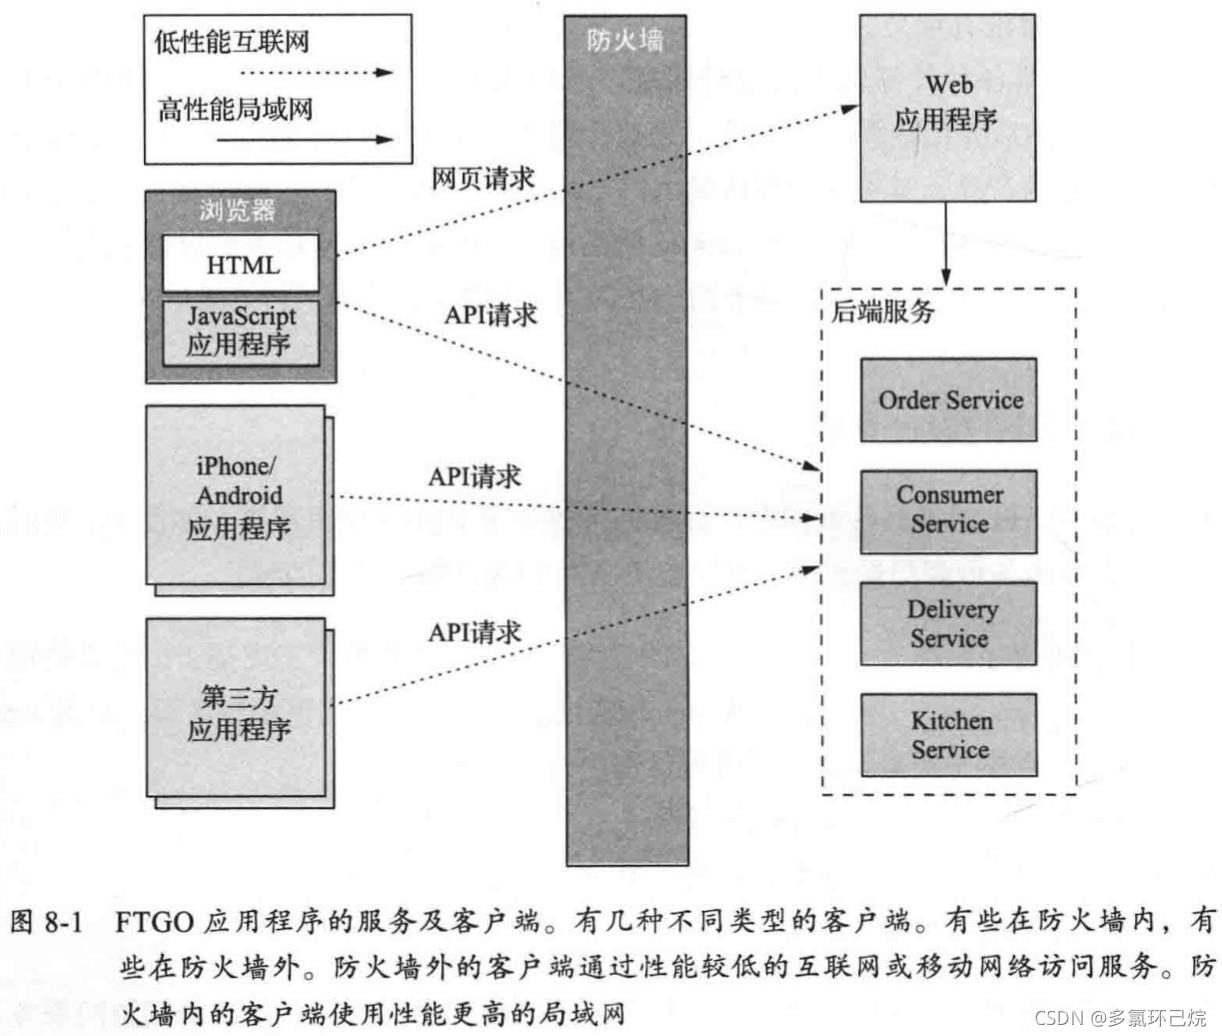 FTGO應用程式的服務及客戶端